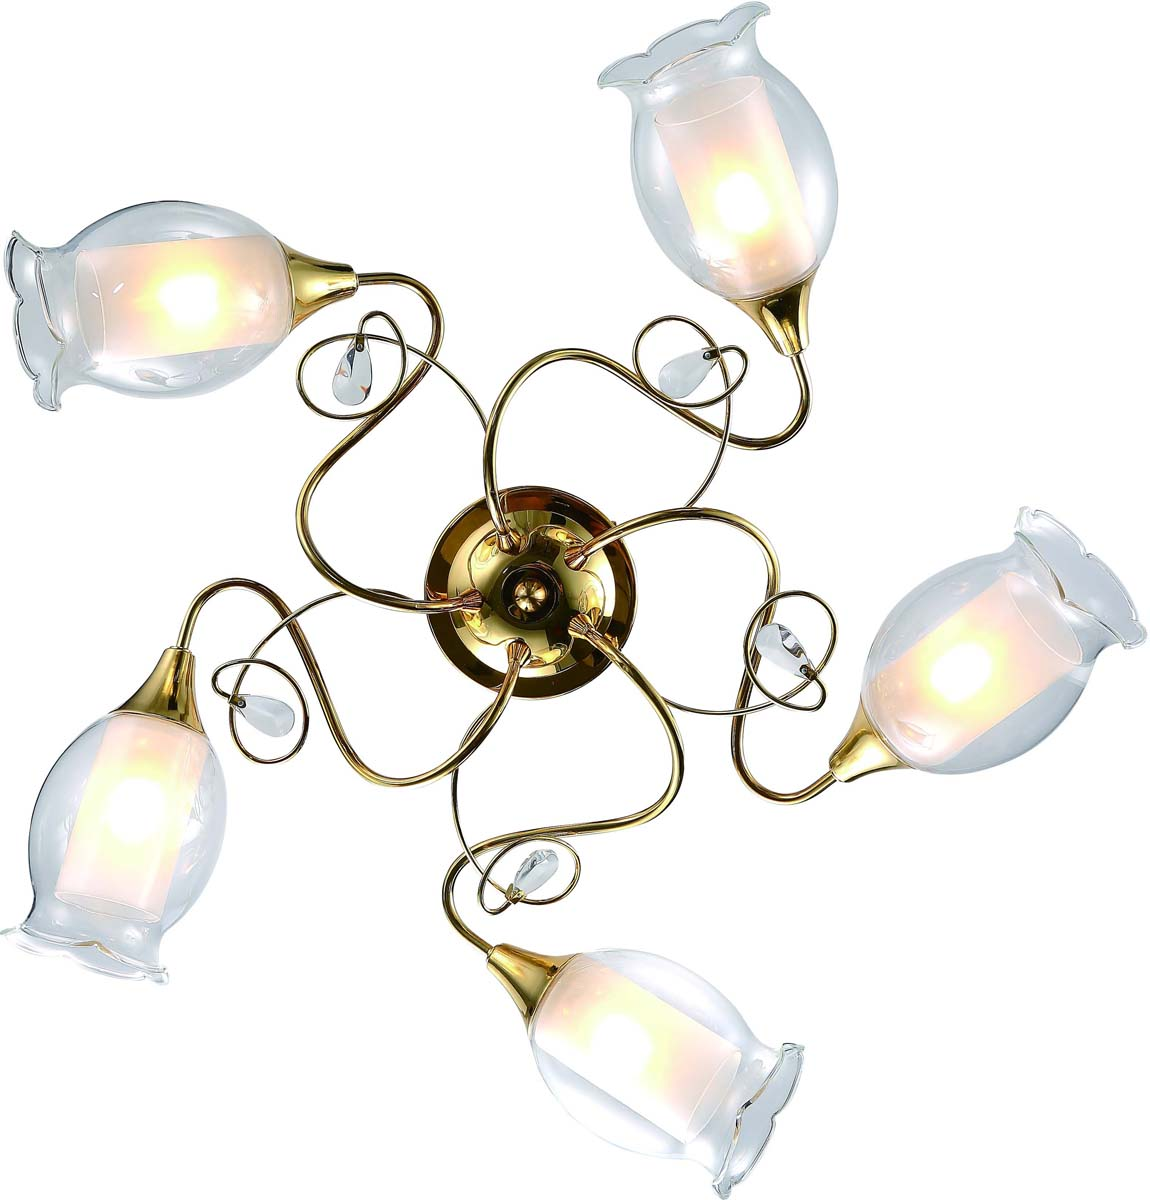 Светильник потолочный Arte Lamp Mughetto, 5 х E14, 40 W. A9289PL-5GO люстра на штанге arte lamp modello a6119pl 5go